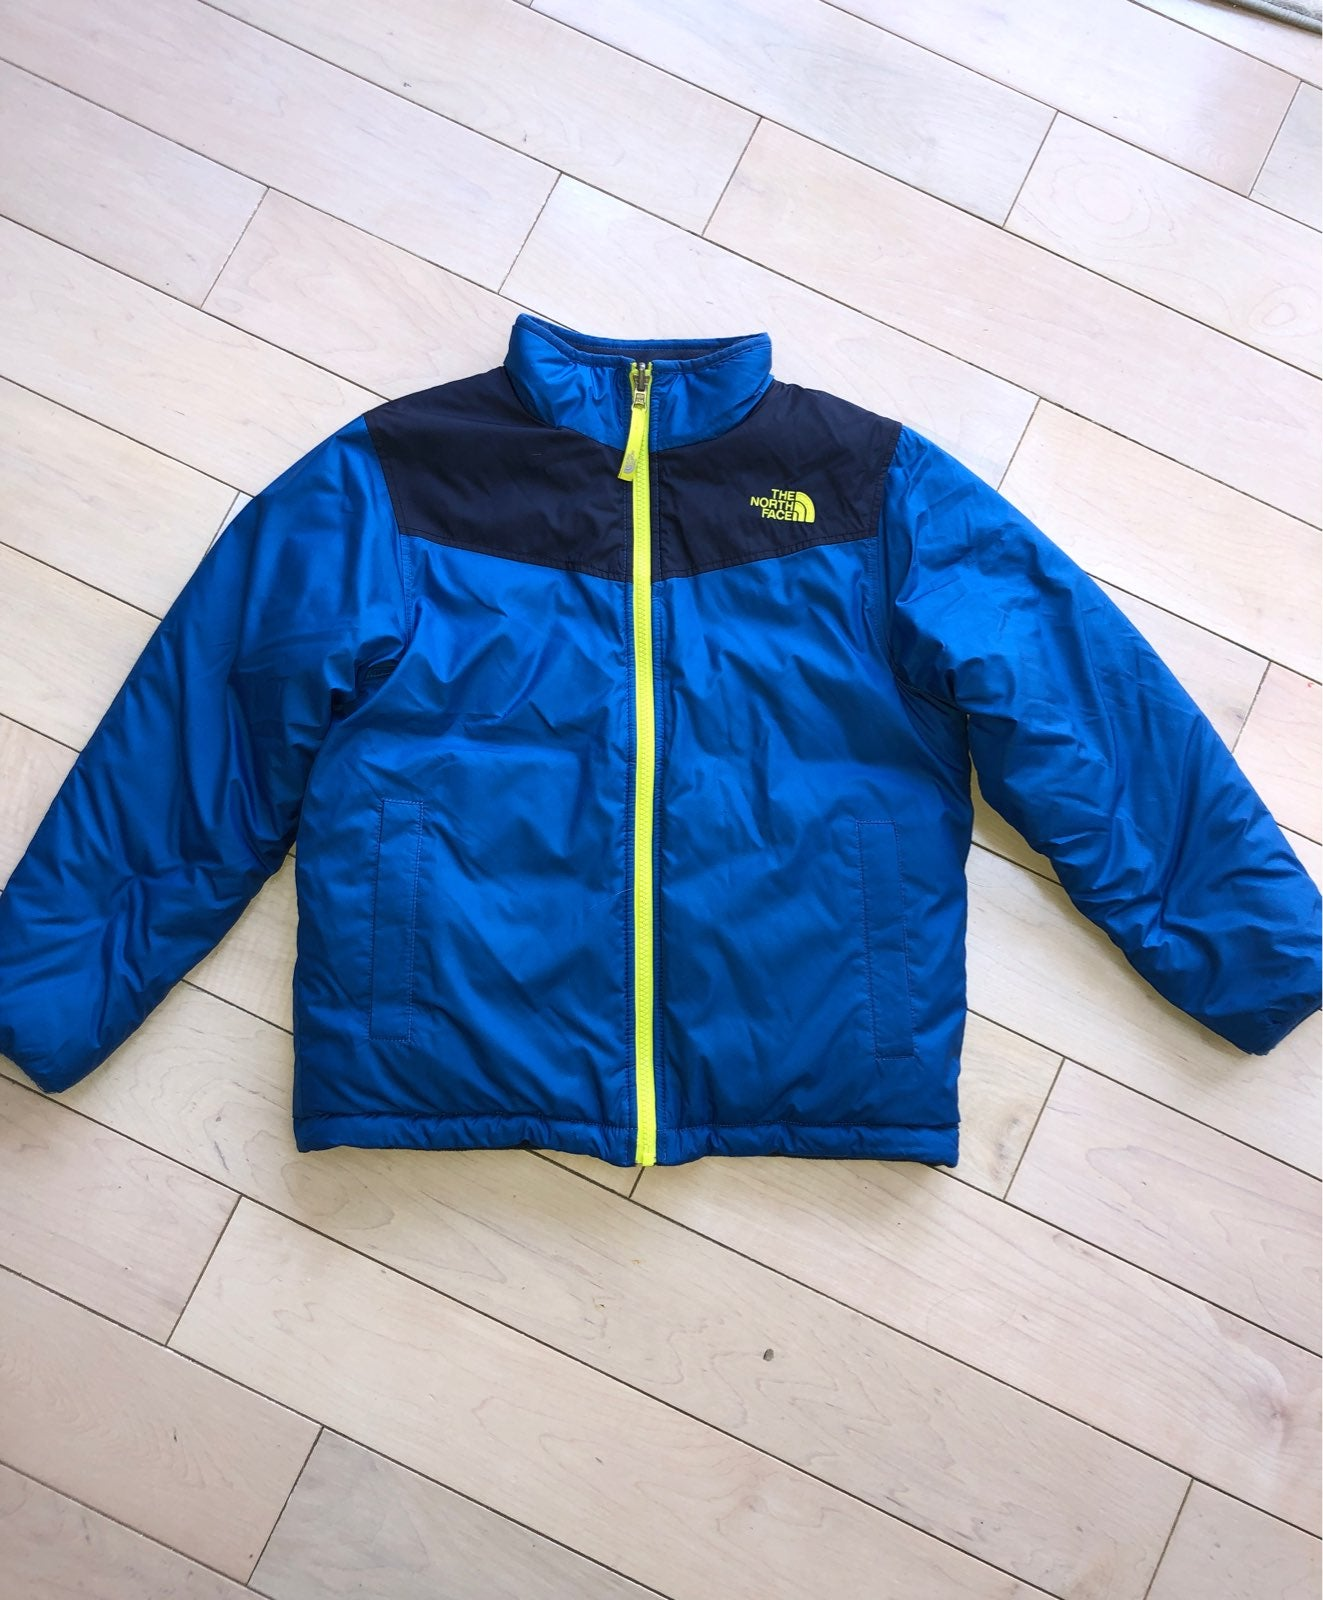 The NorthFace reversible jacket 10